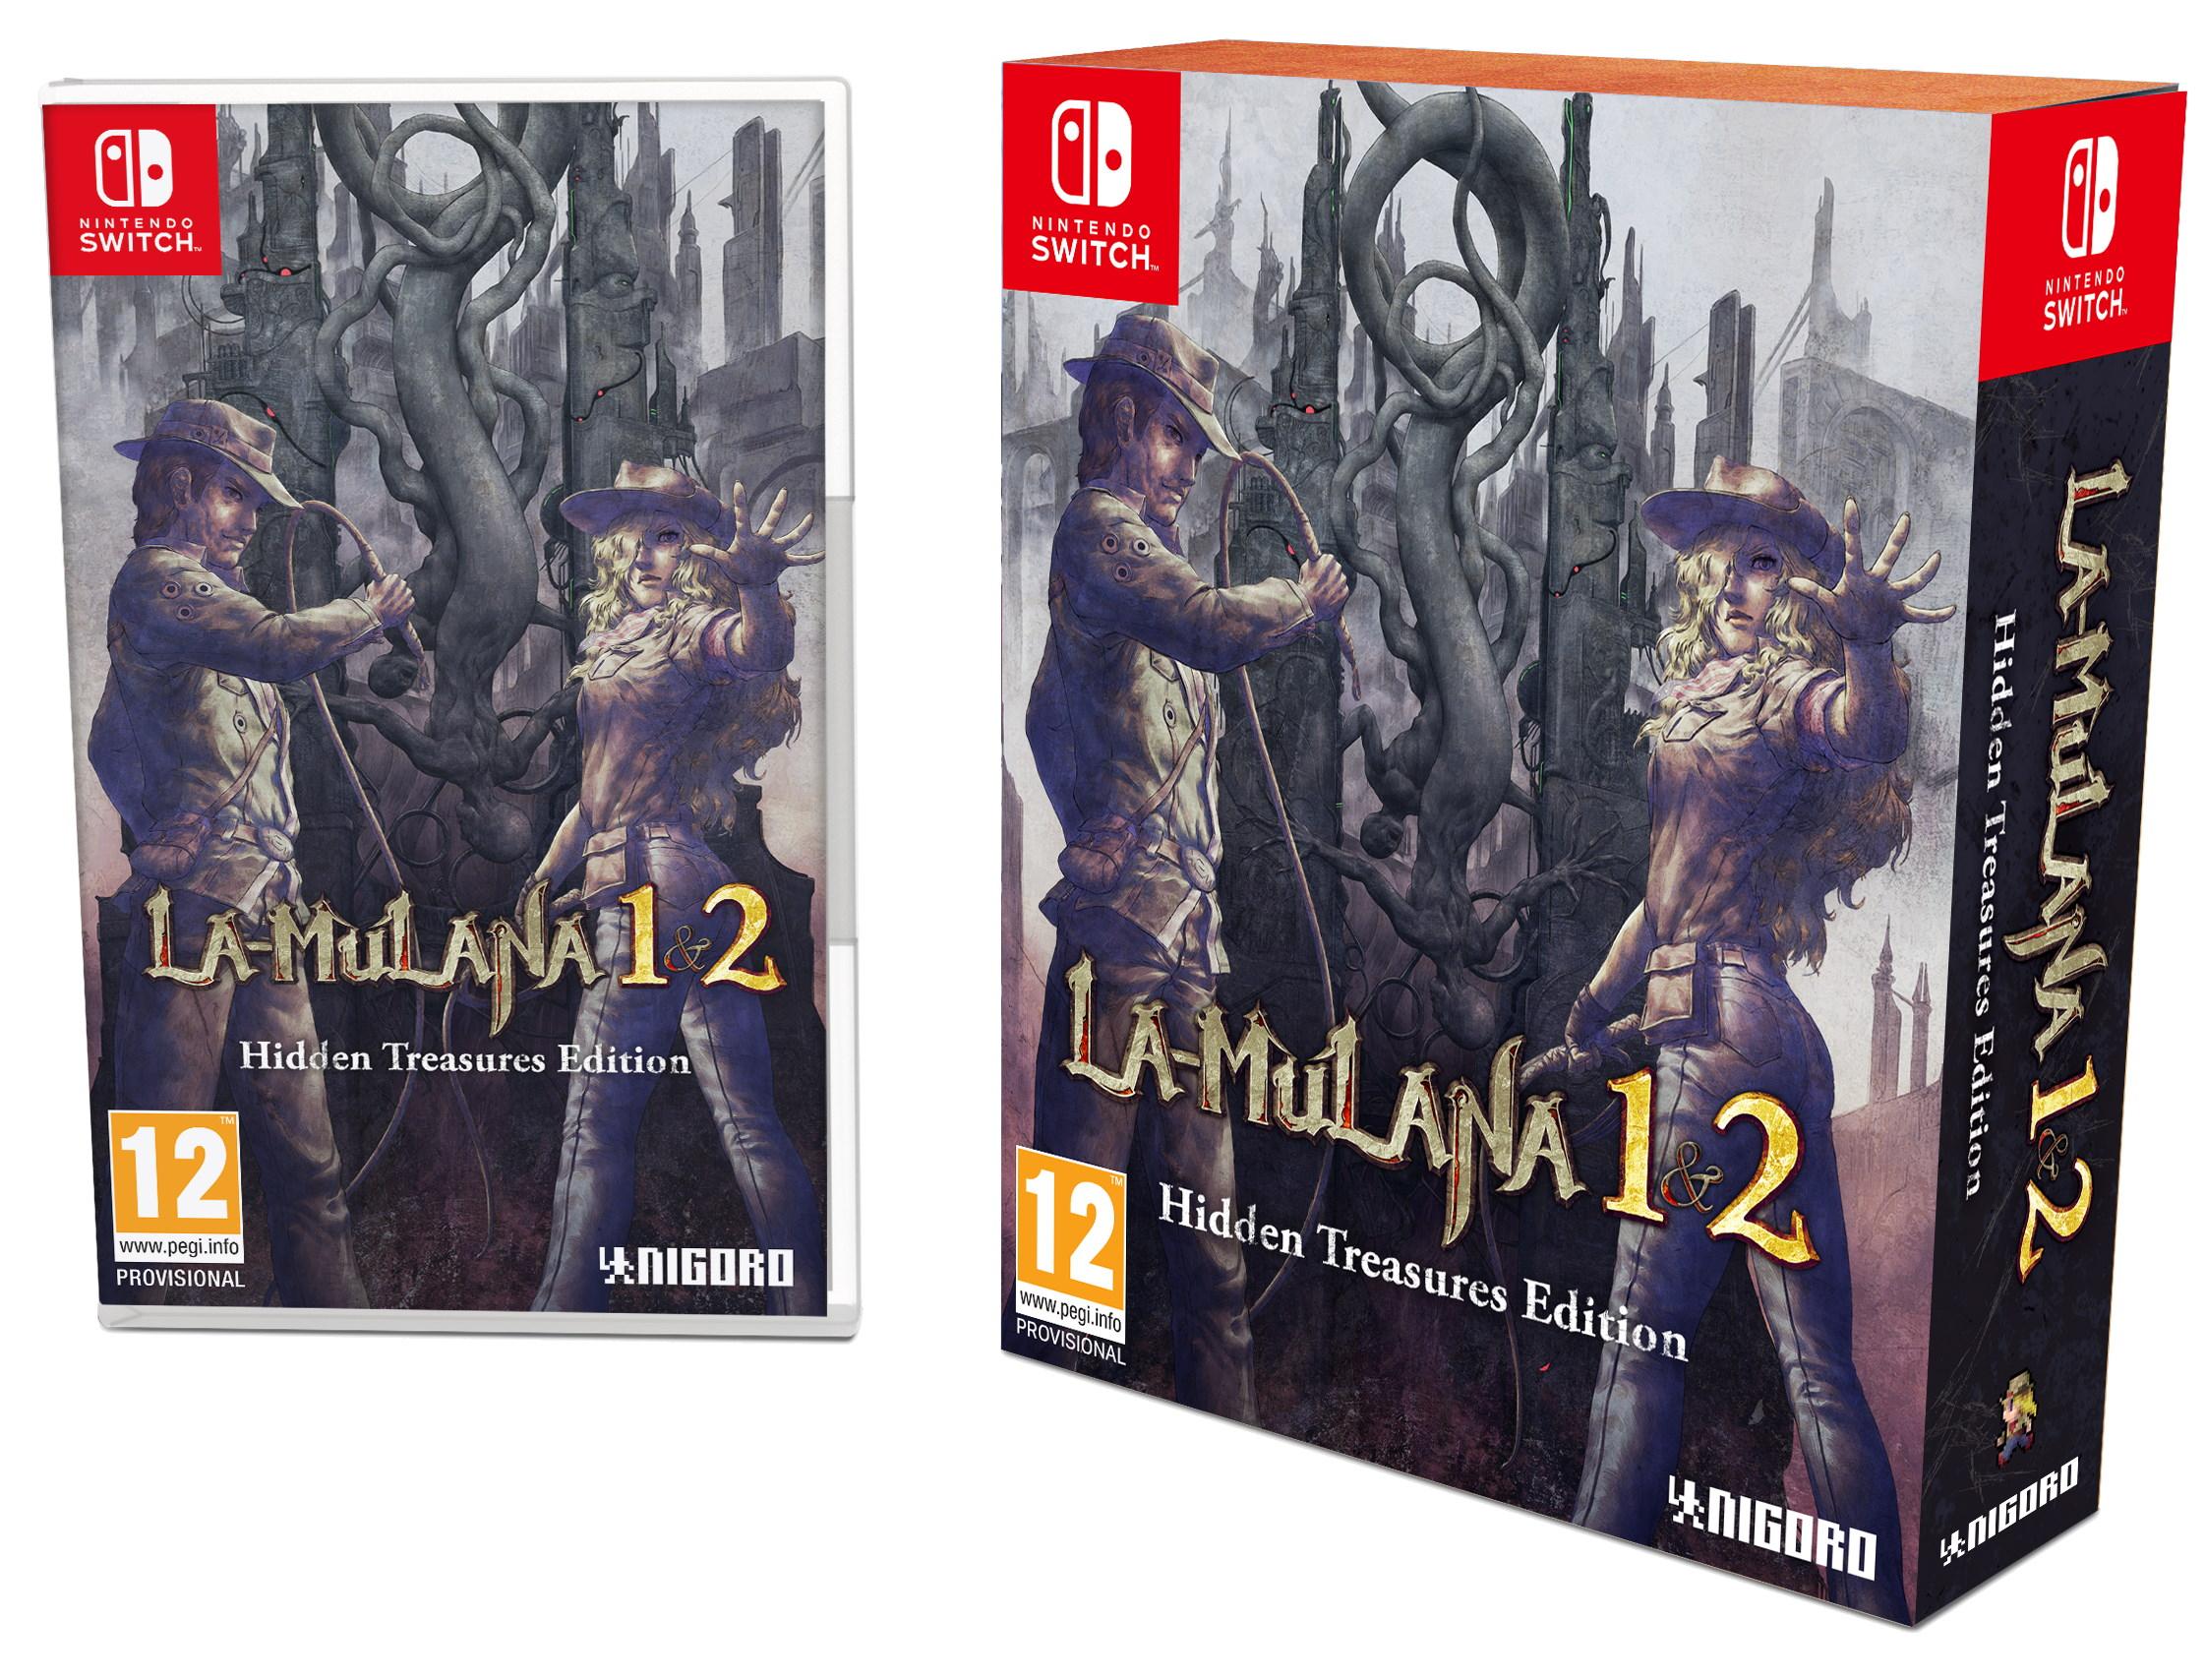 La-Mulana 1 & 2 (Hidden Treasures Special Edition) - Nintendo Switch - Physical / US Import - Coolshop £33.95